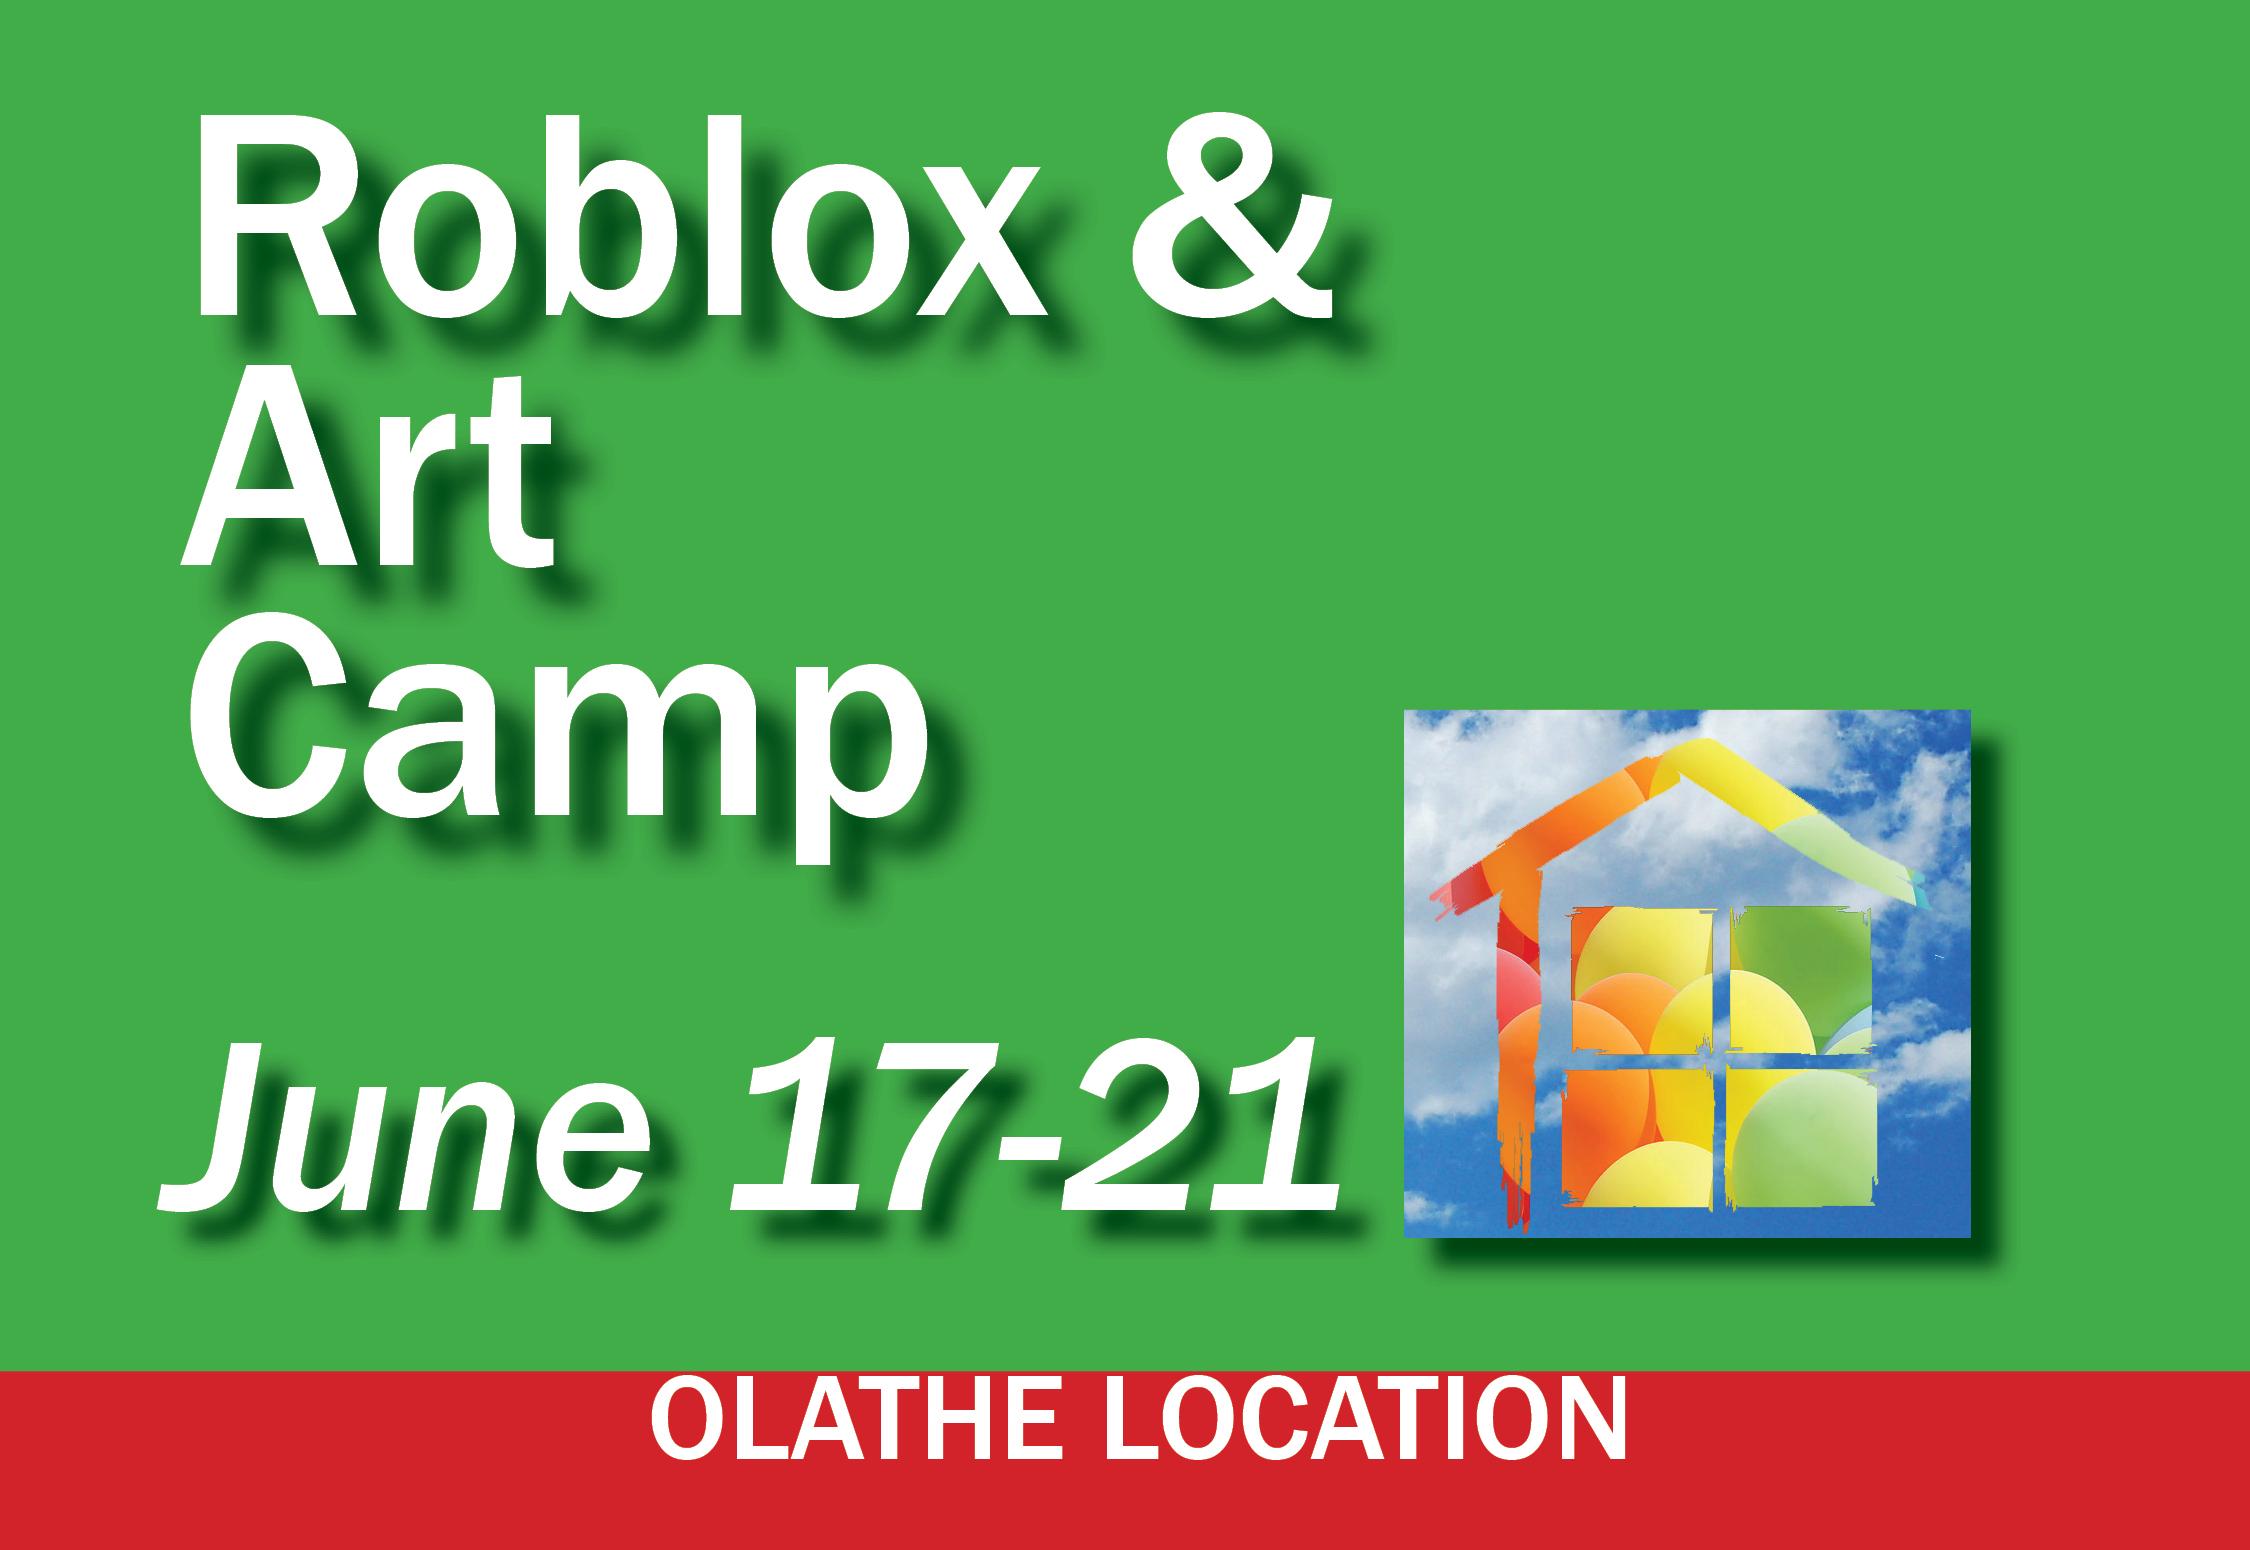 Robox June 17 camp icon.jpg